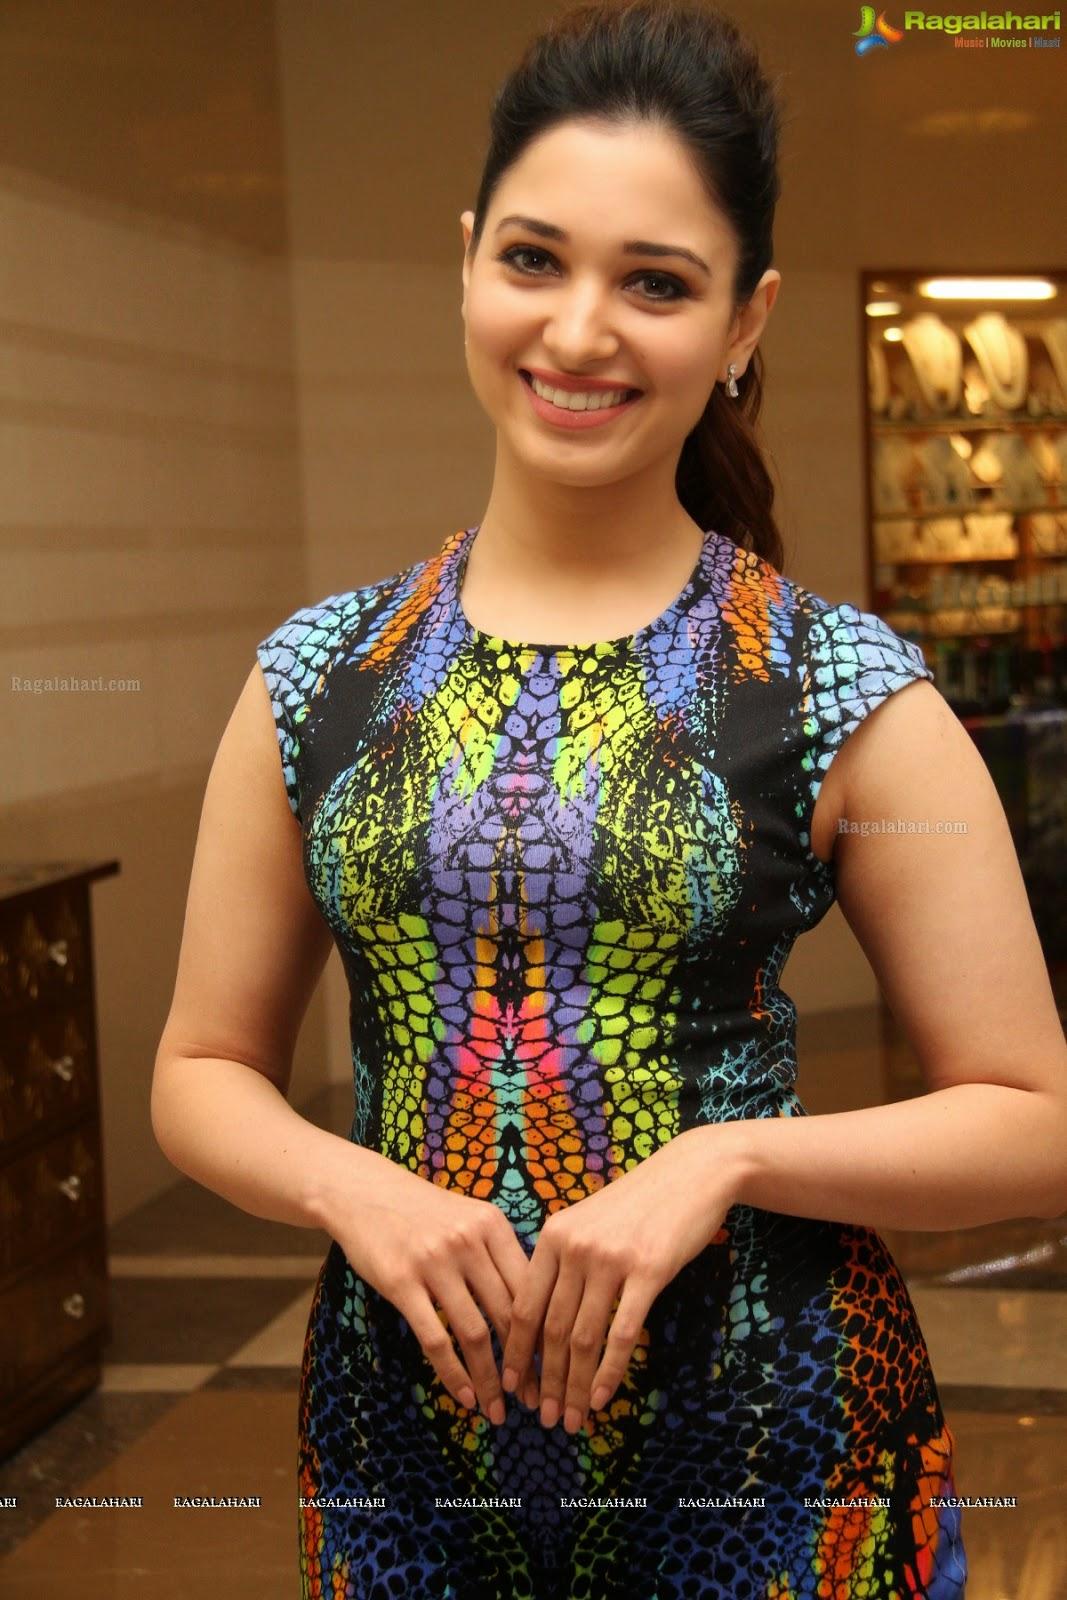 wsww: tamil n telugu actress tamanna bhatia cute hot launches celkon